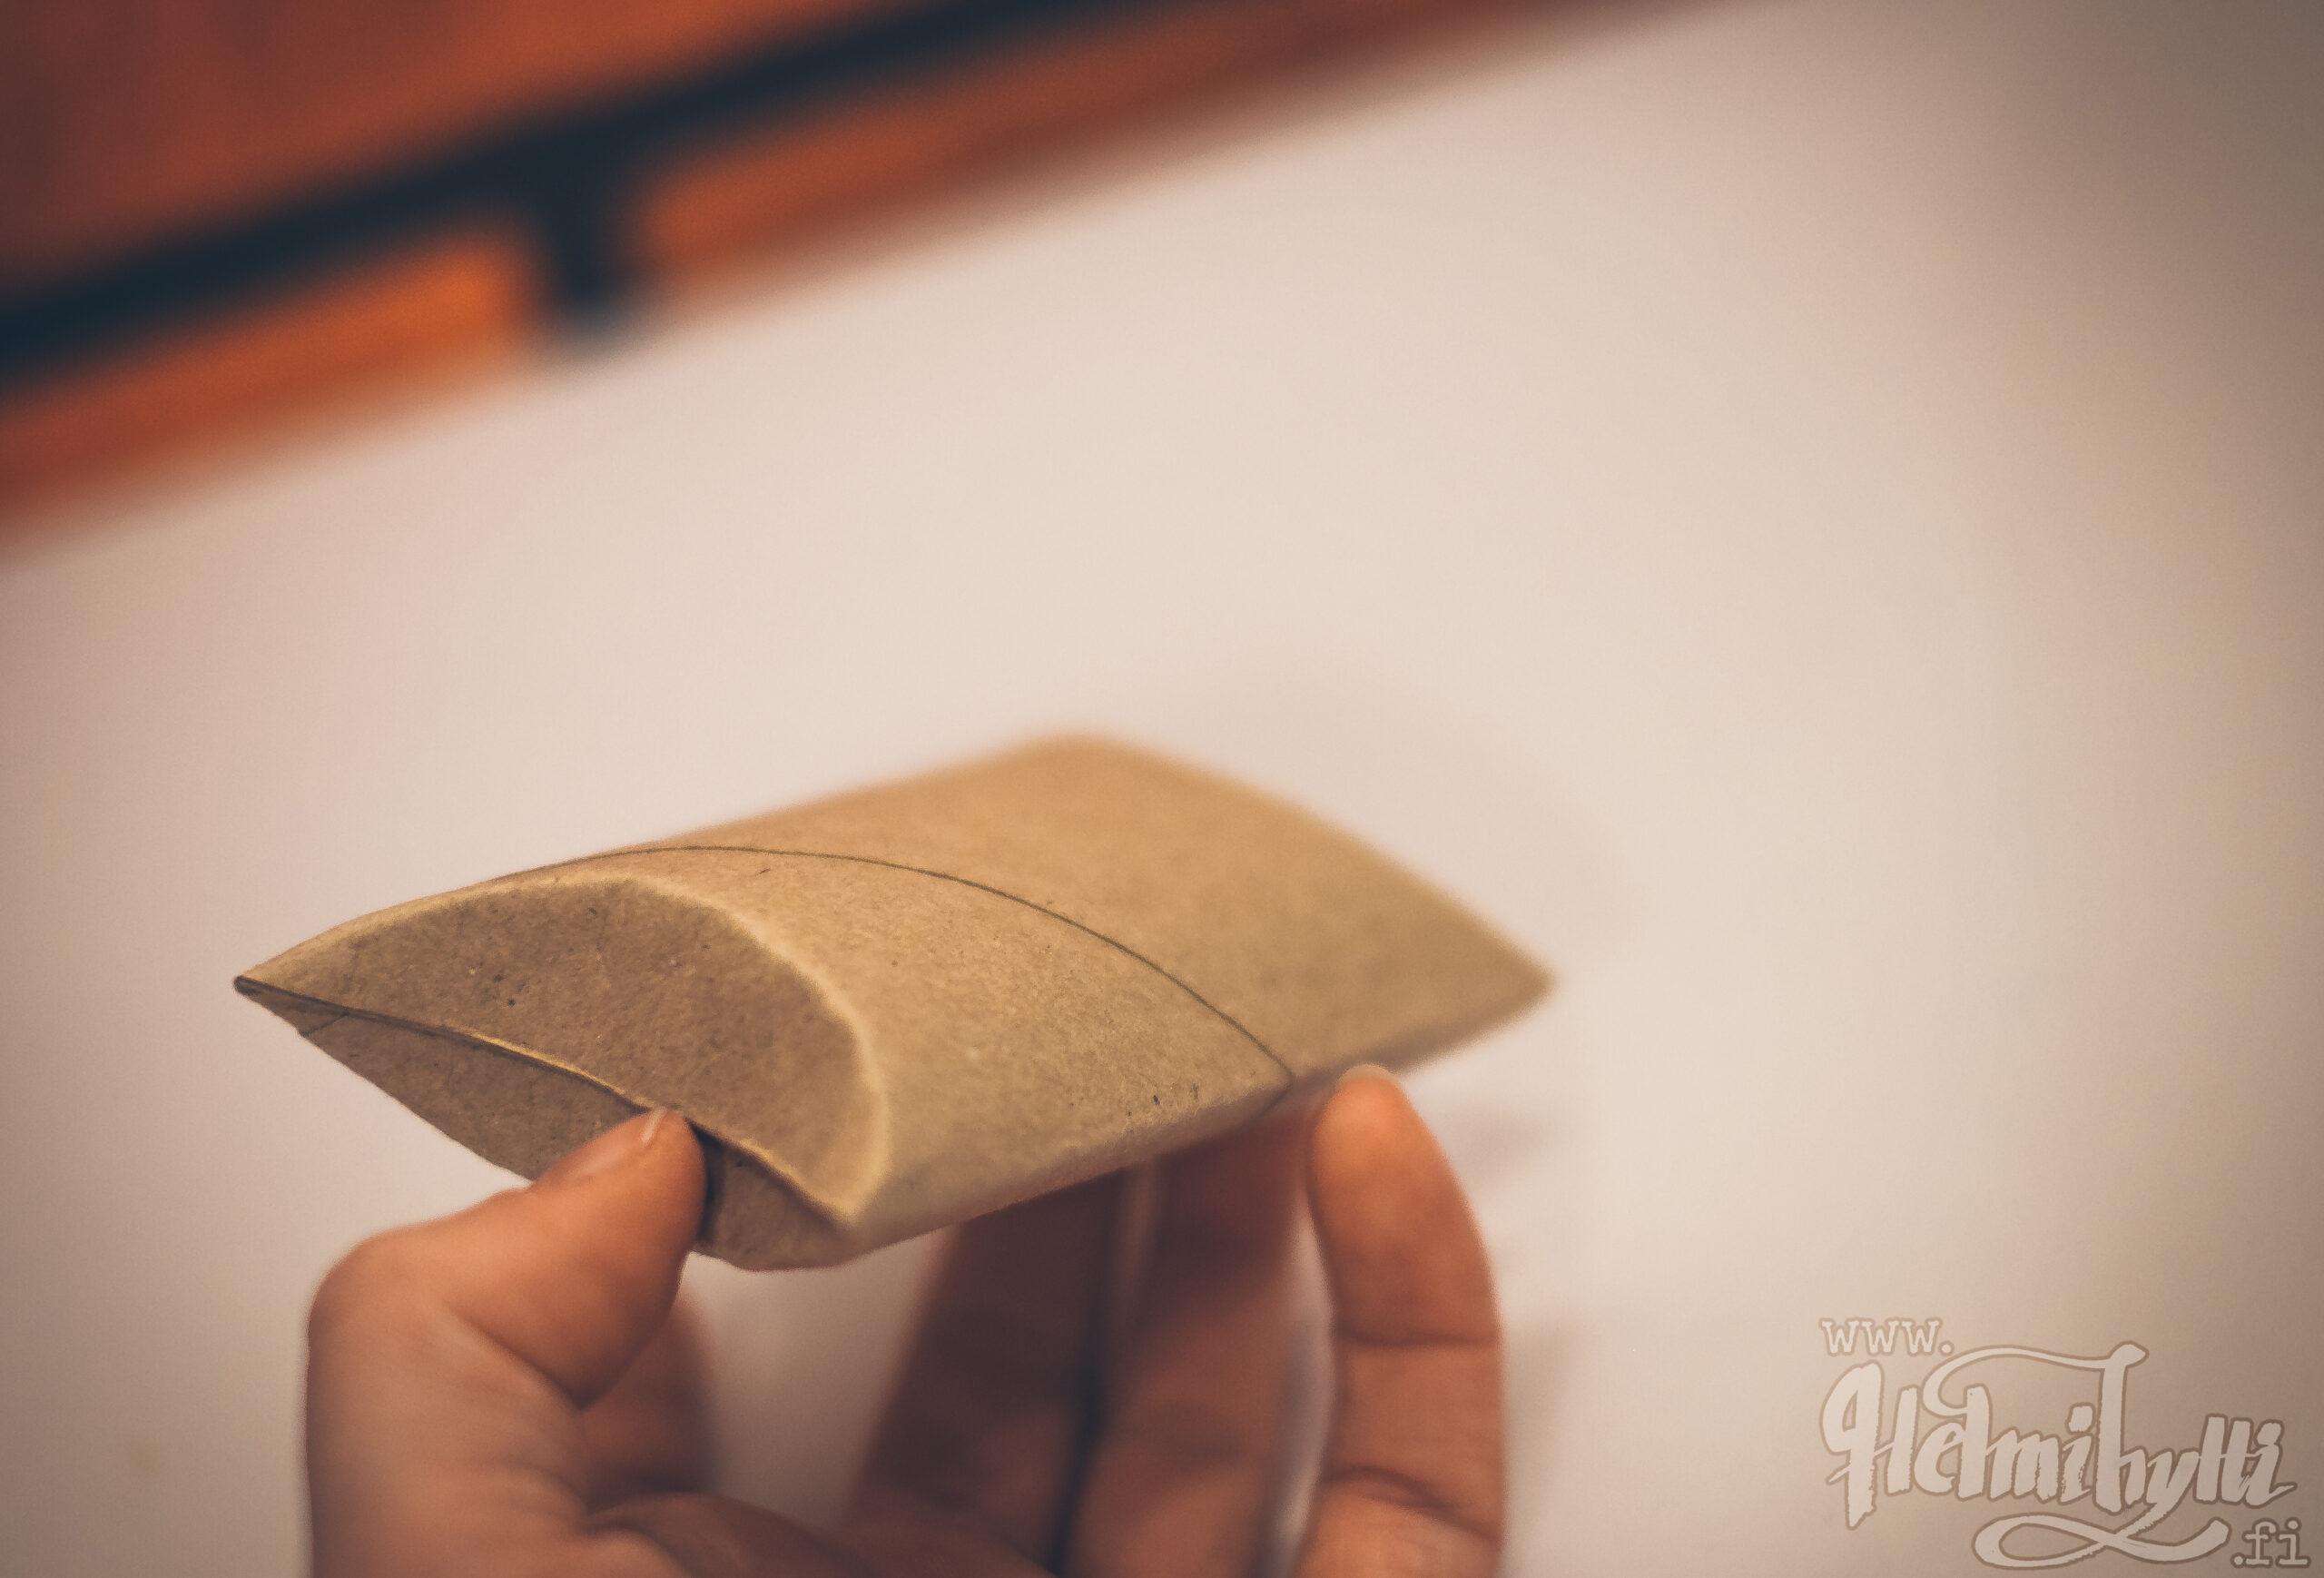 paketointi-idea